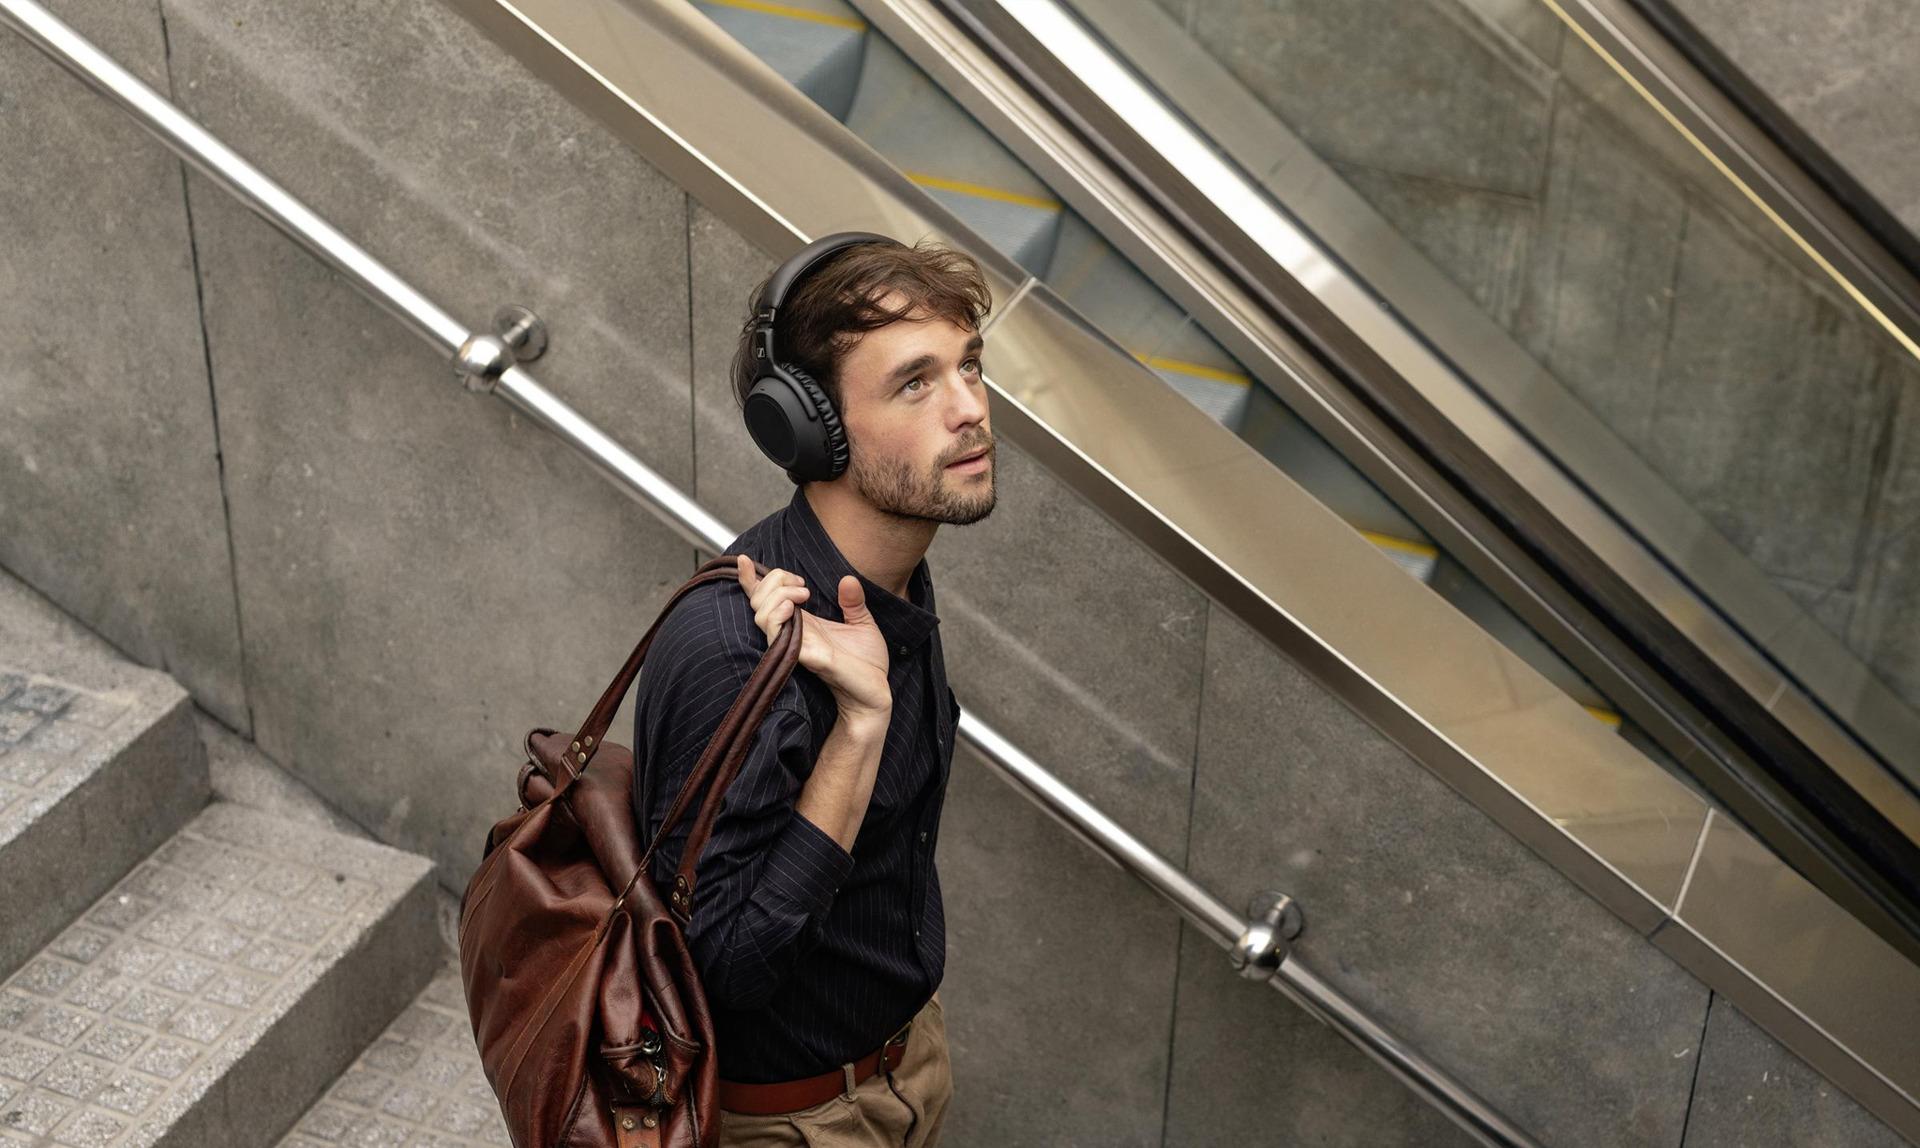 Back to Uni Audio Essentials from Sennheiser